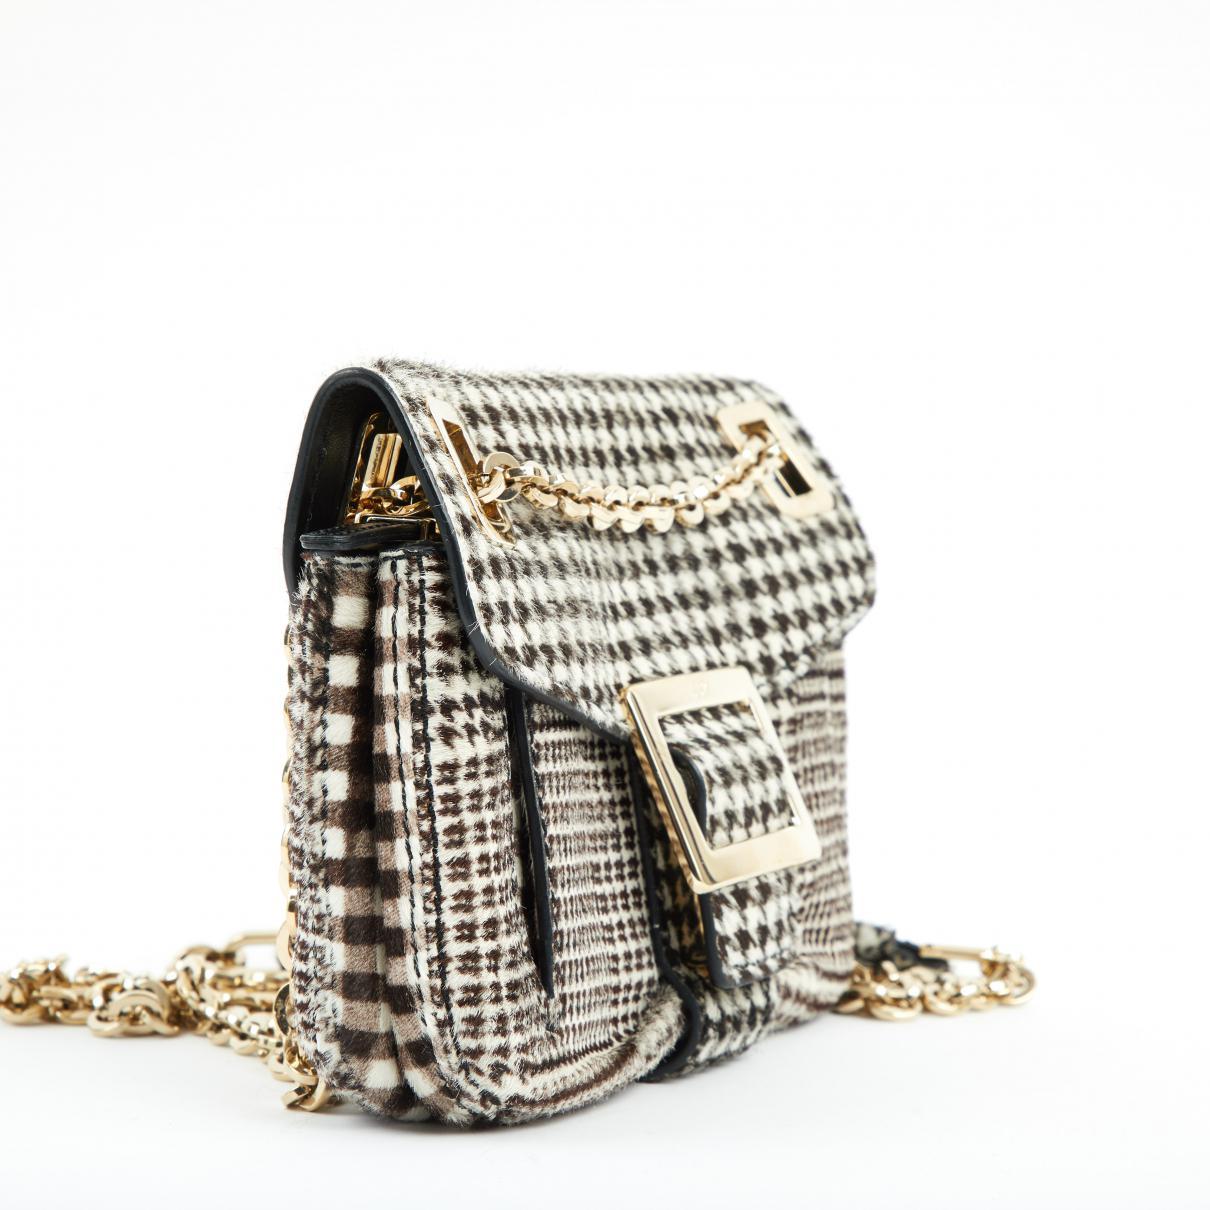 3d016bd78f4a Roger Vivier - Black Pony-style Calfskin Handbag - Lyst. View fullscreen